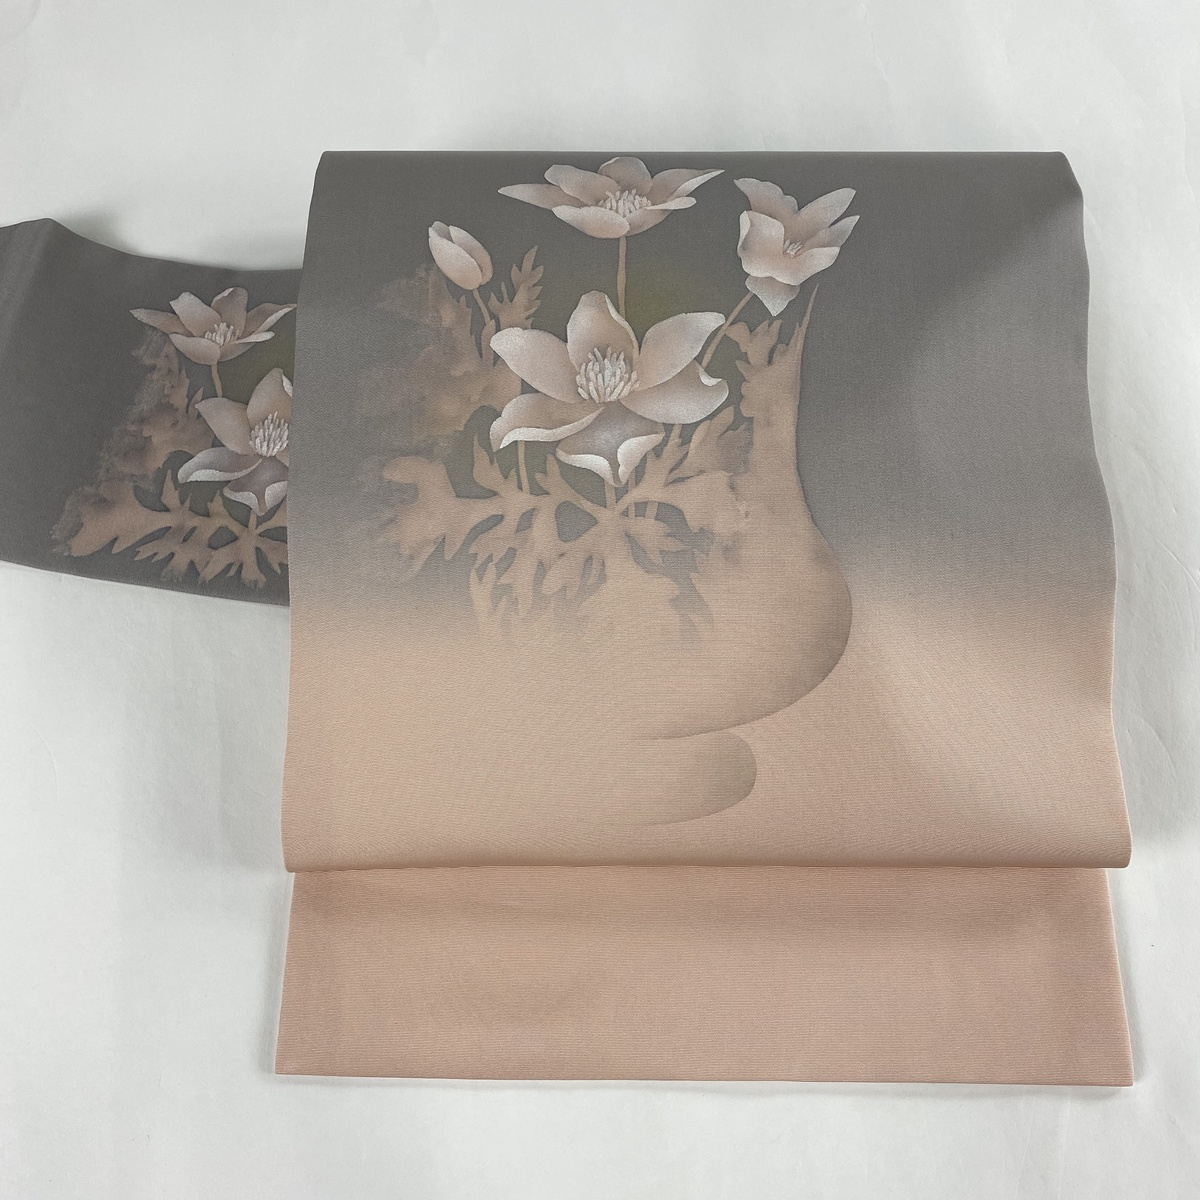 名古屋帯 美品 名品 花器 草花 金彩 ぼかし 鼠色 正絹 【中古】